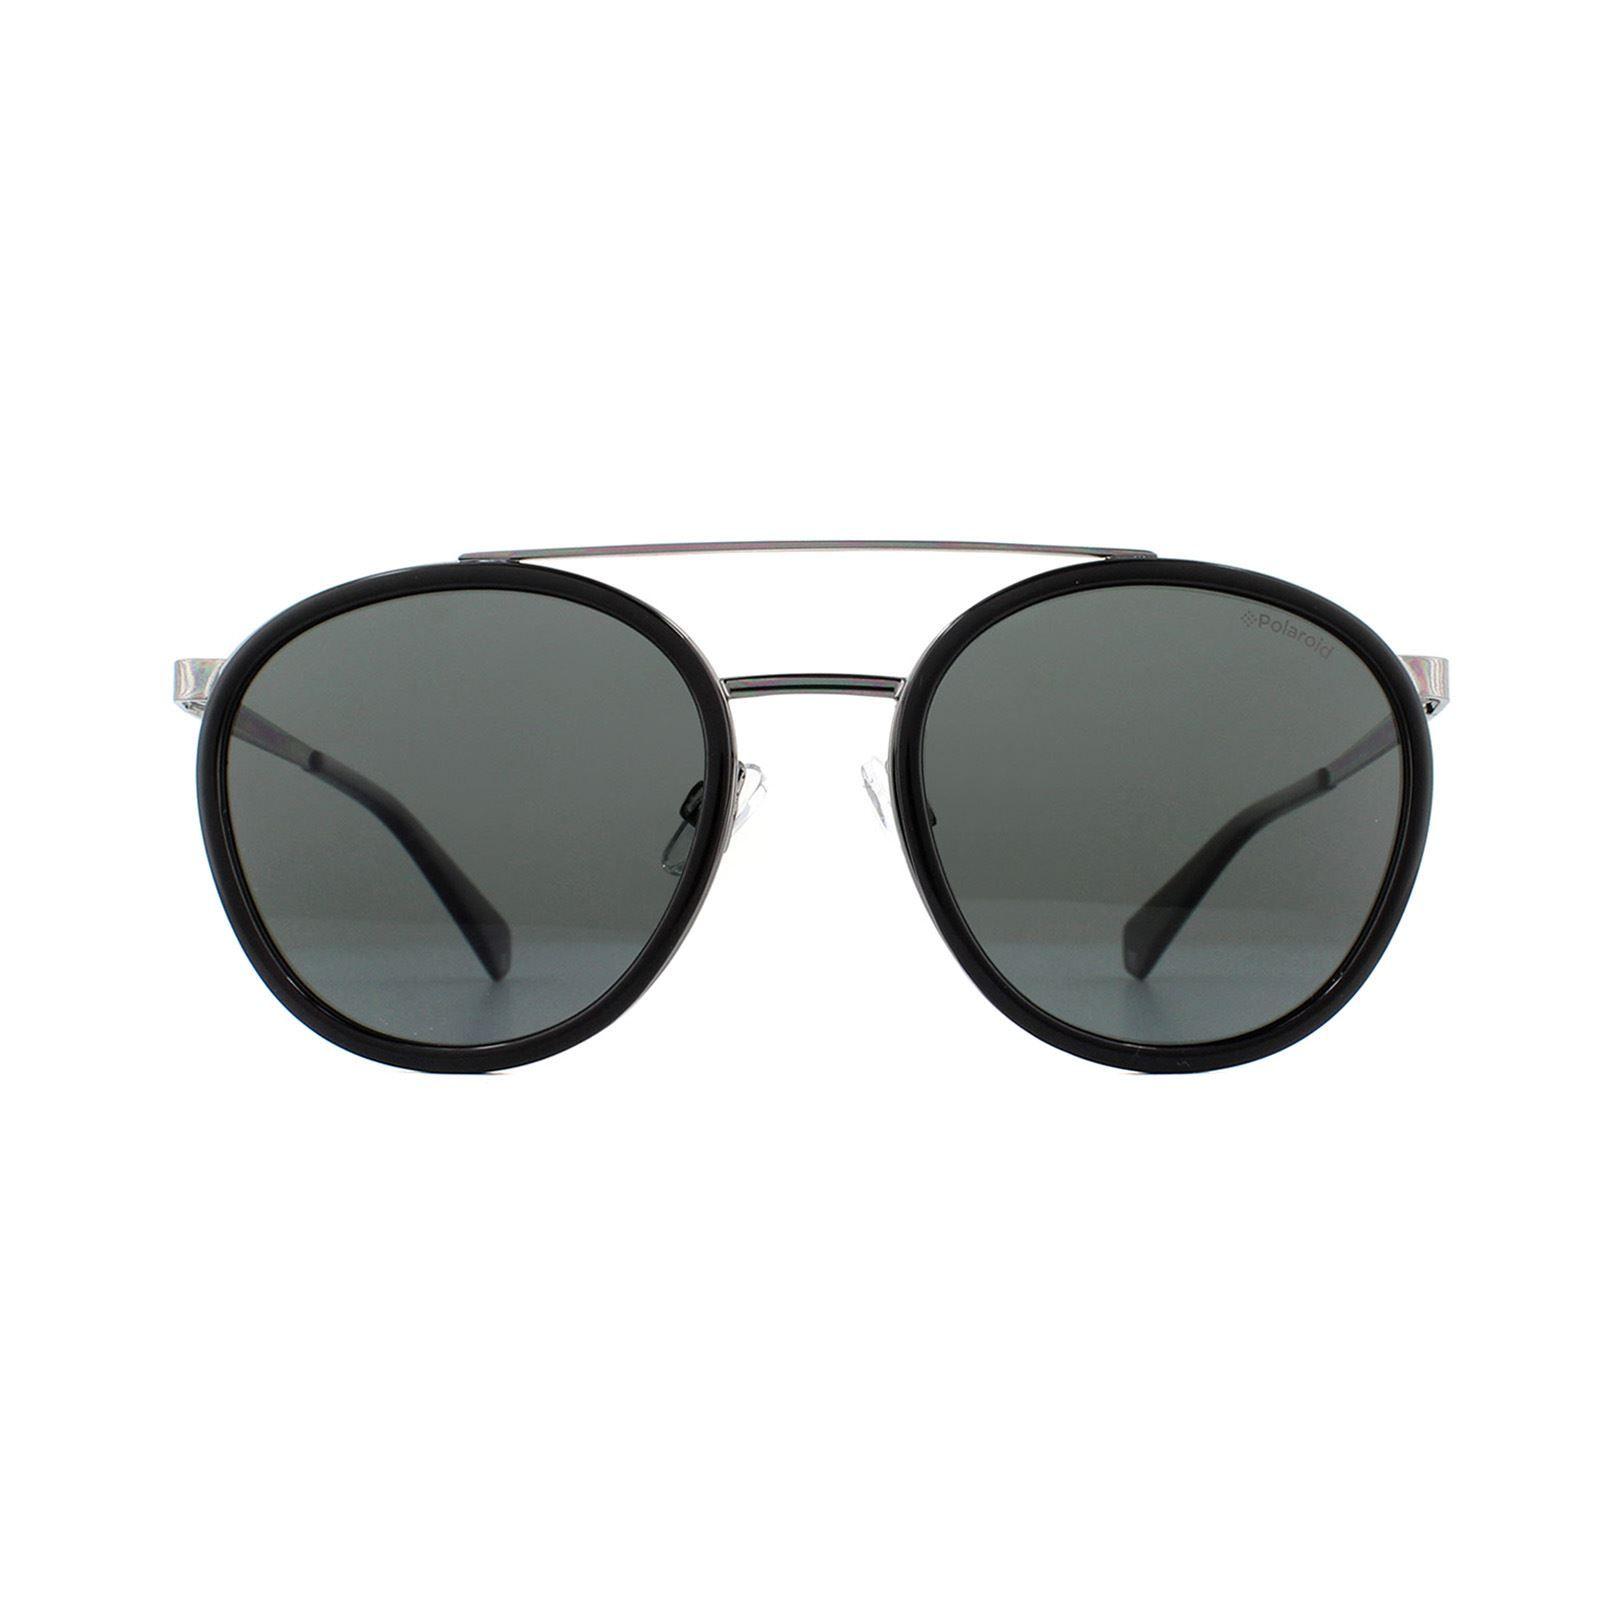 Polaroid Sunglasses PLD 6032/S 807 M9 Black Grey Polarized